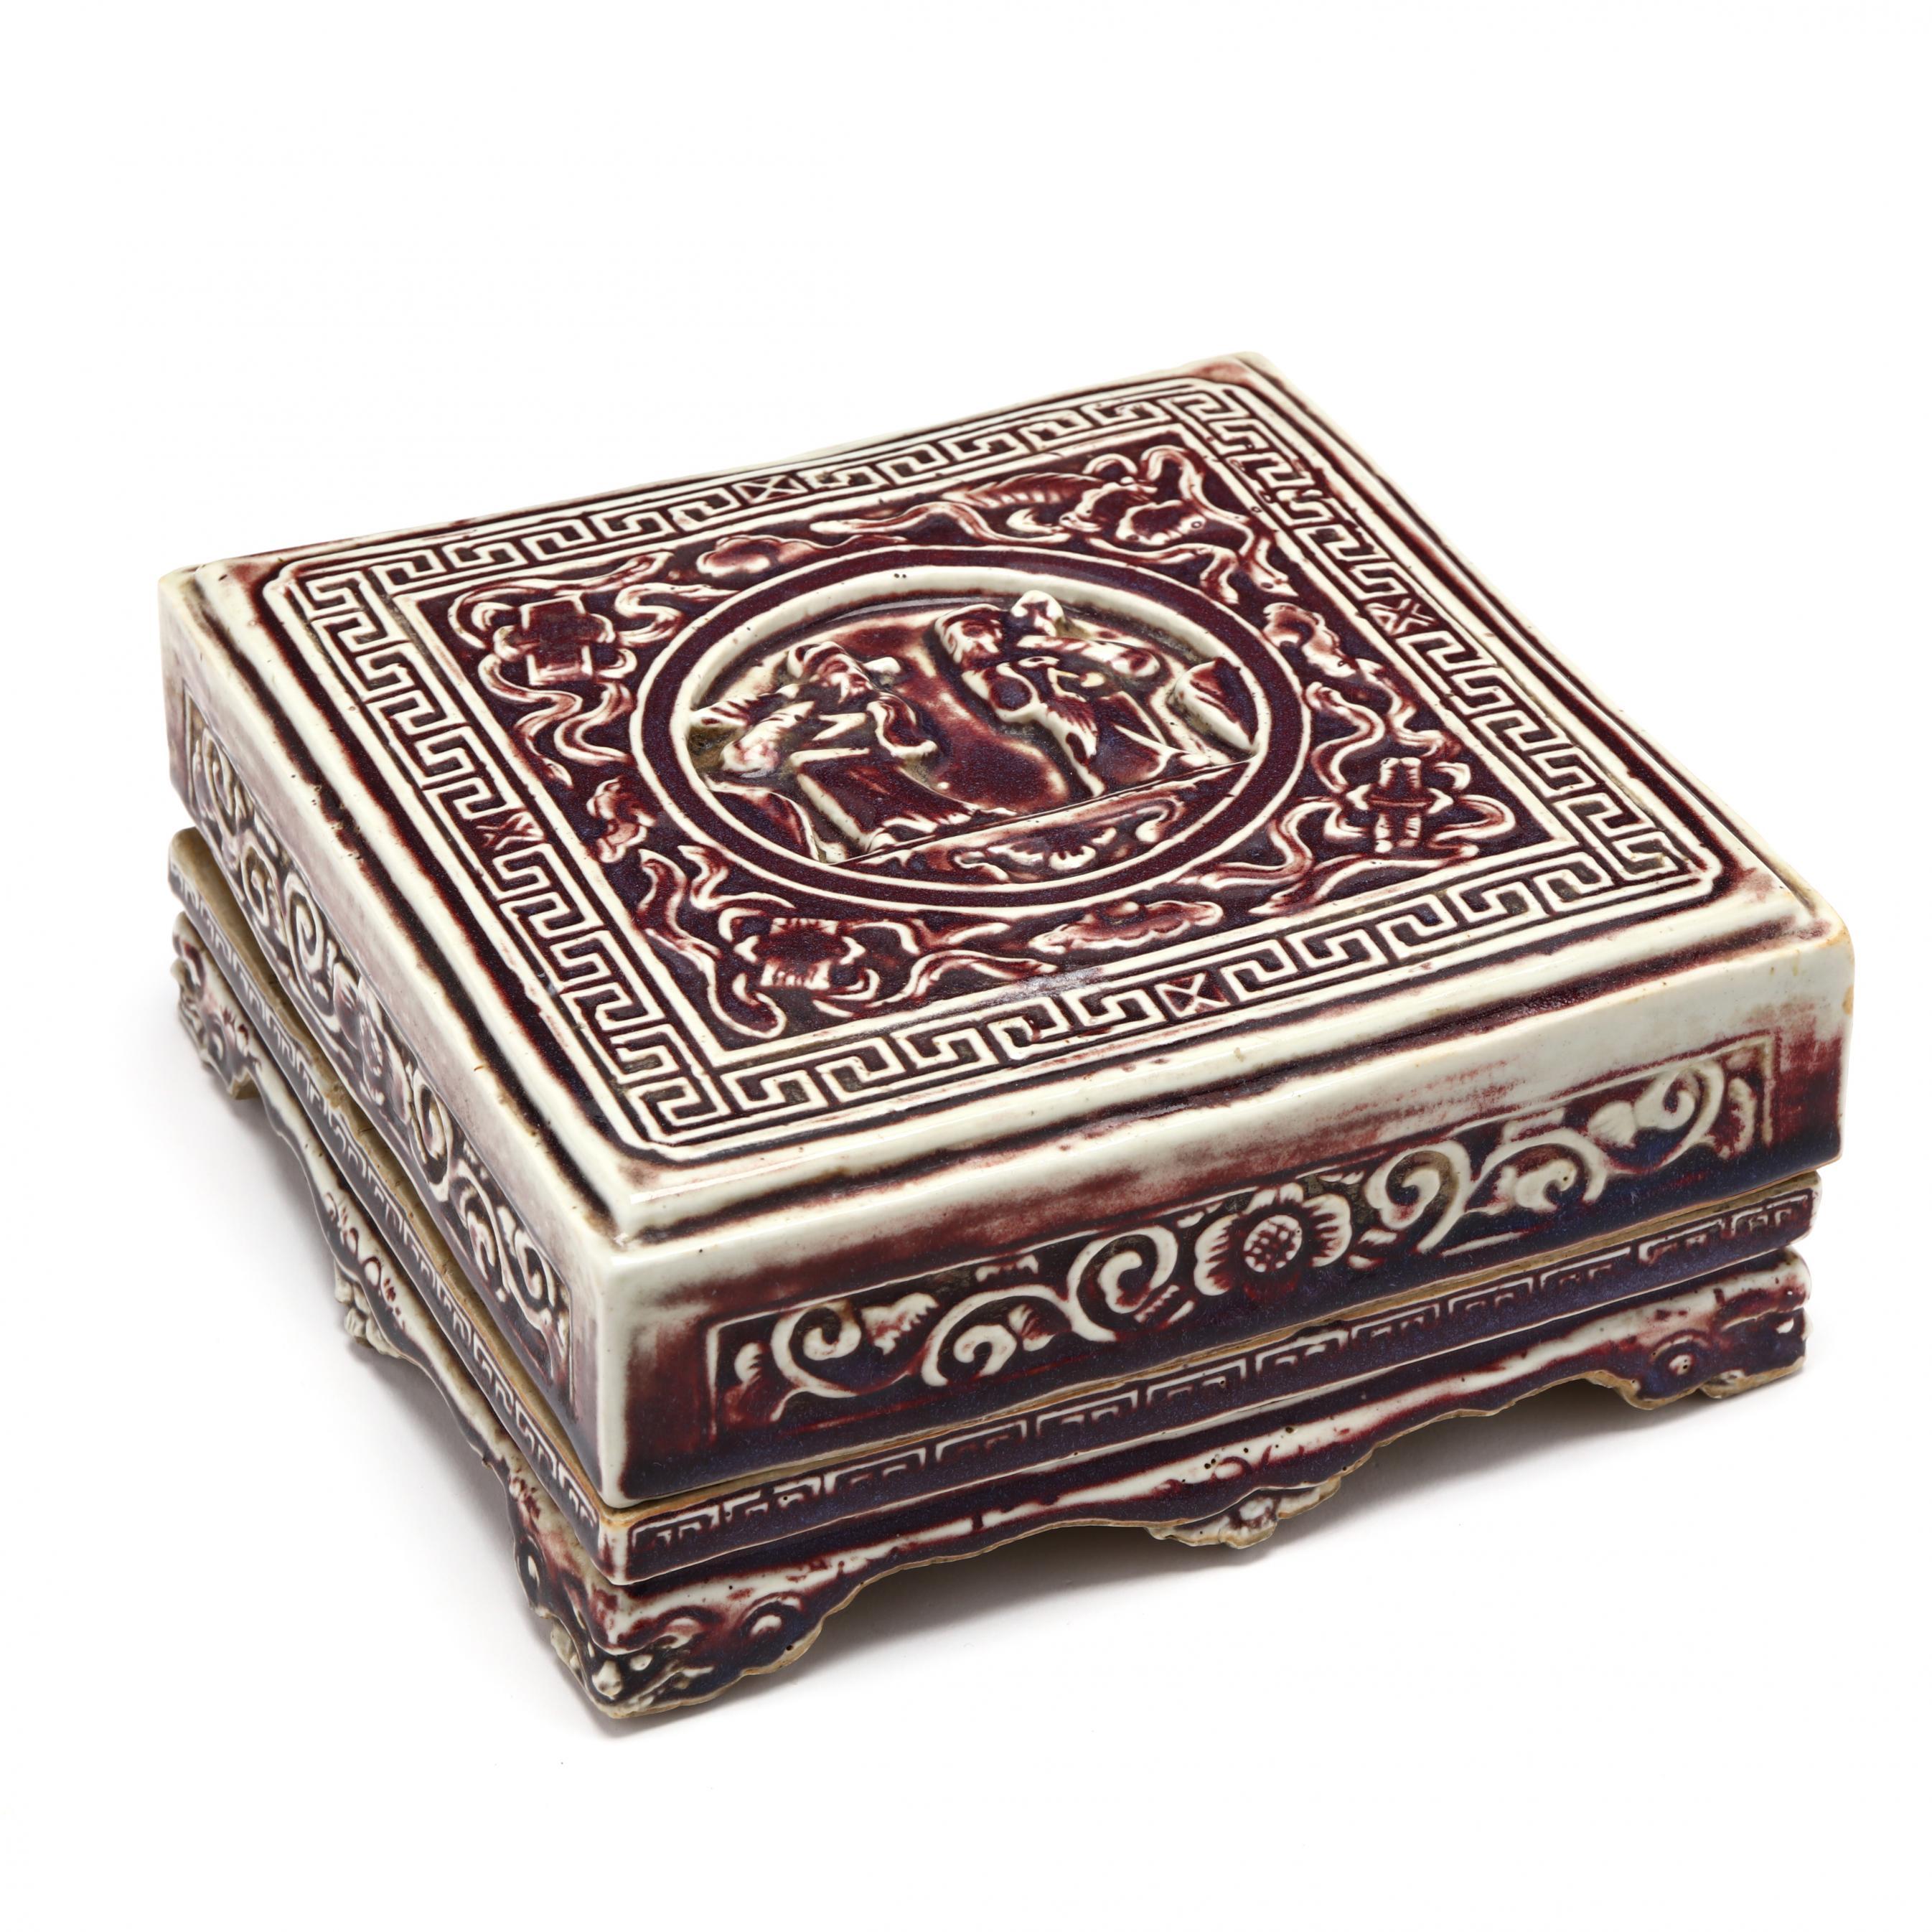 a-lidded-porcelain-presentation-box